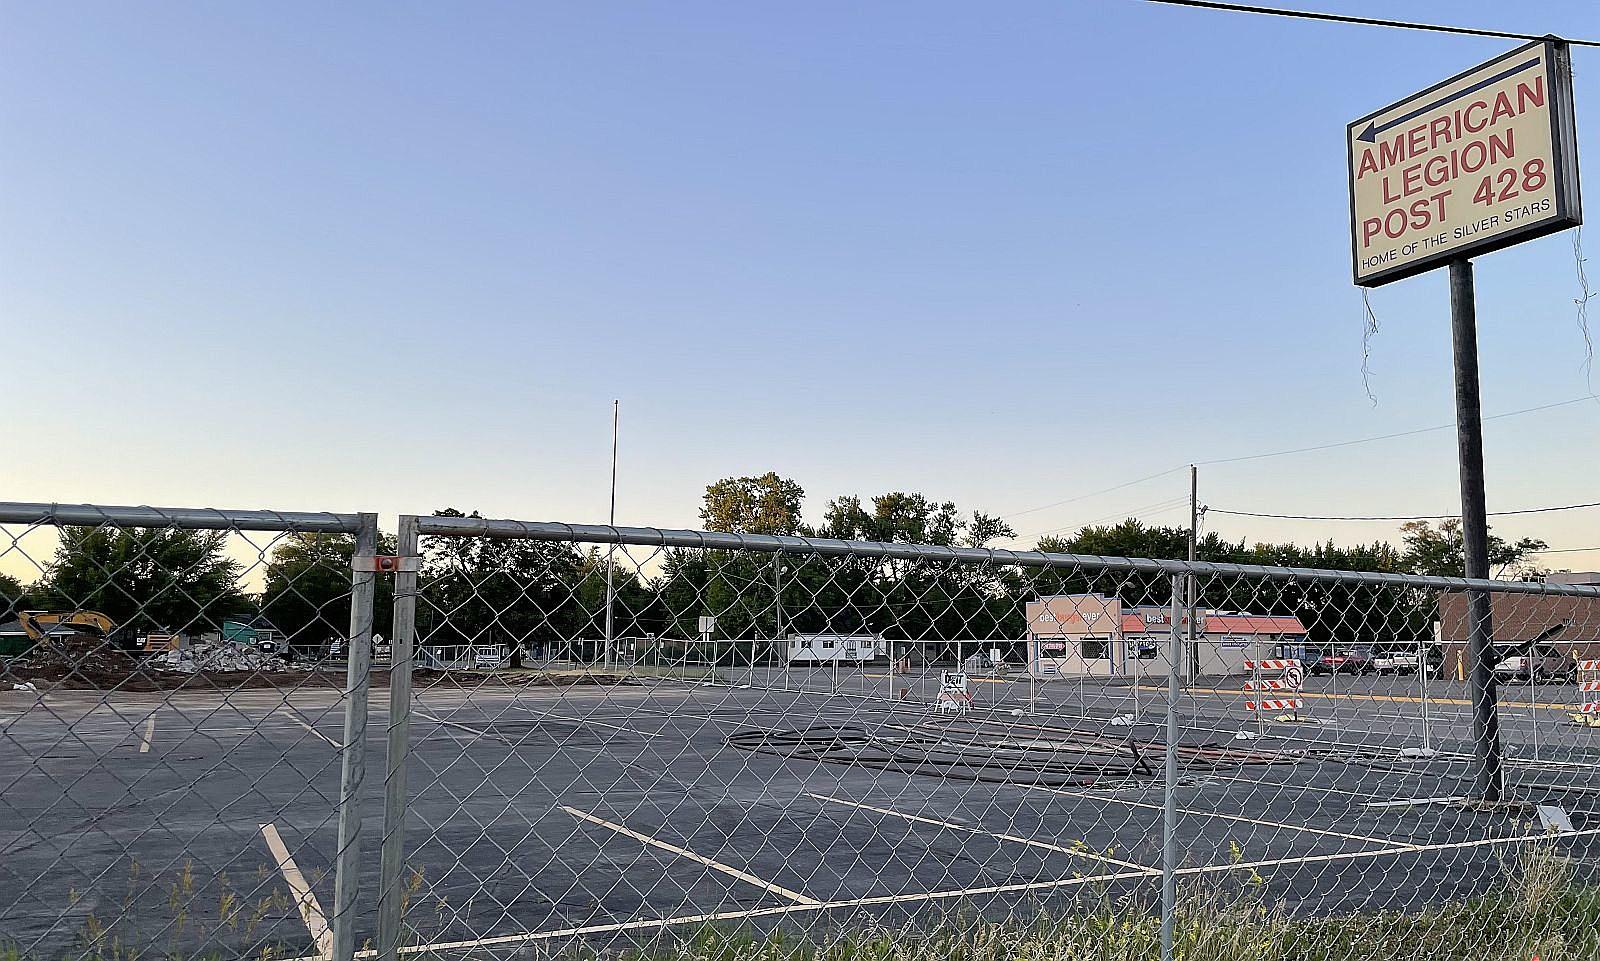 Waite Park American Legion Building Reduced to Rubble